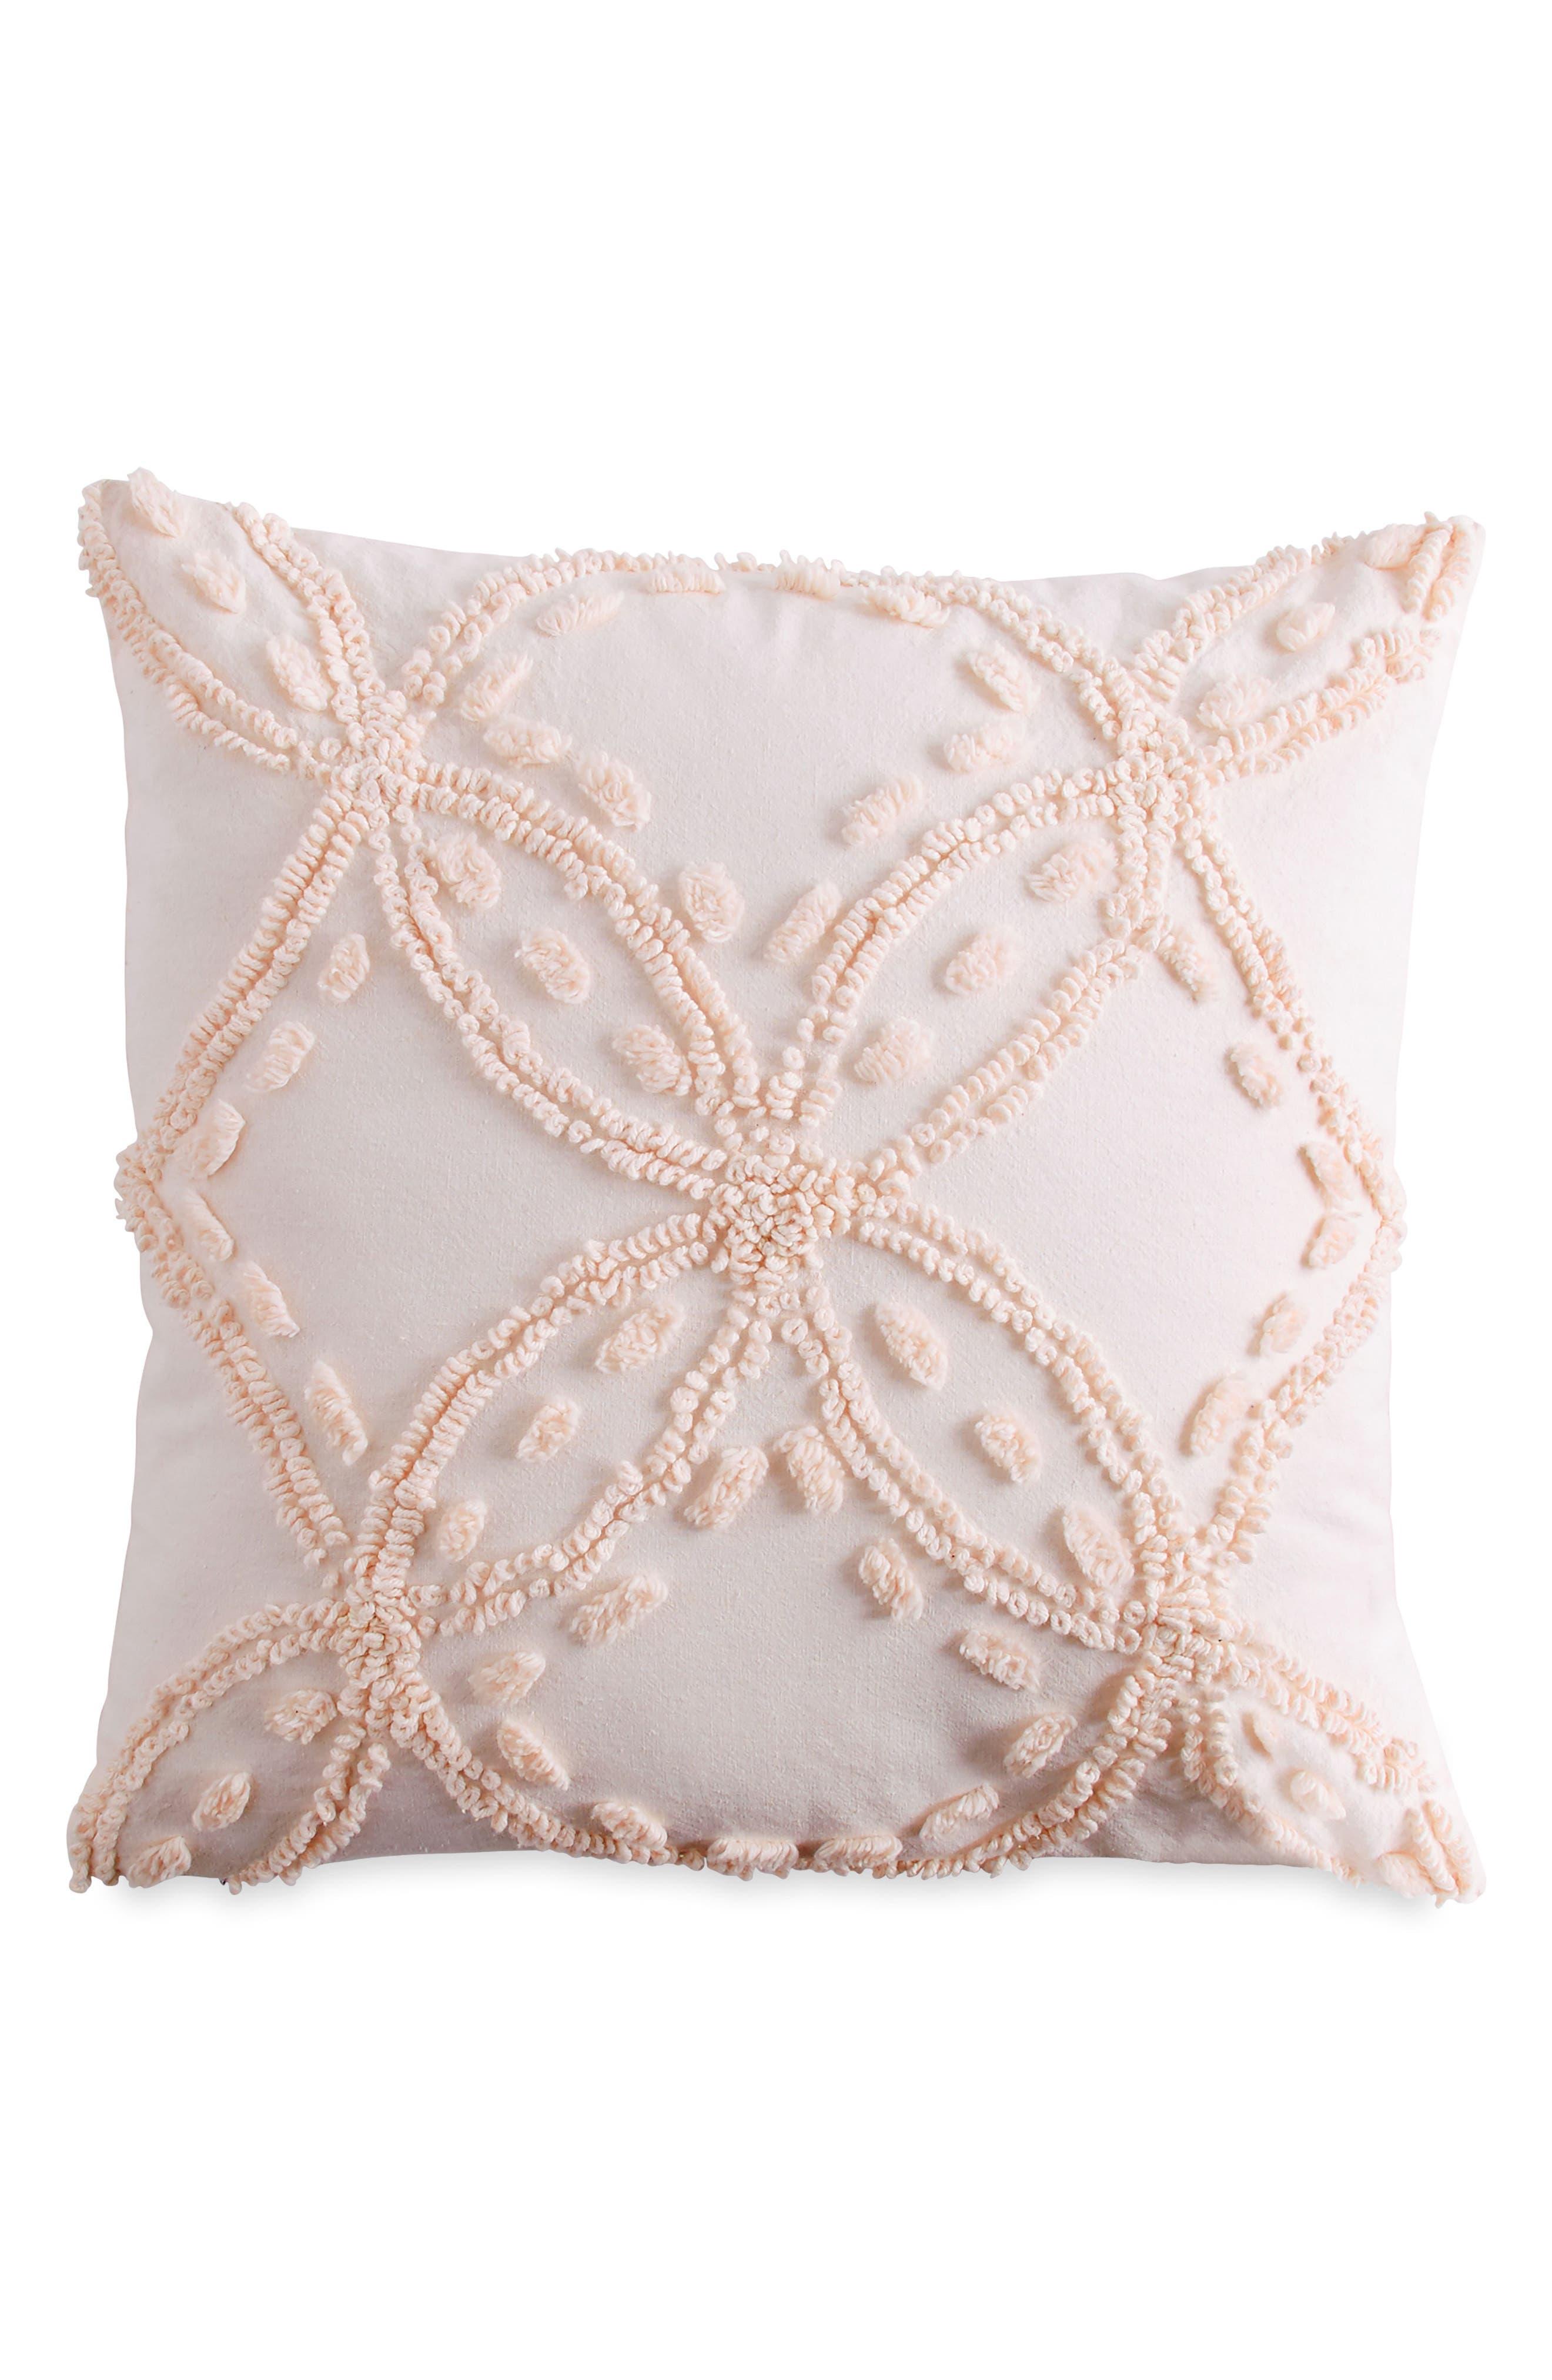 Chenille Pillow,                             Main thumbnail 1, color,                             Blush